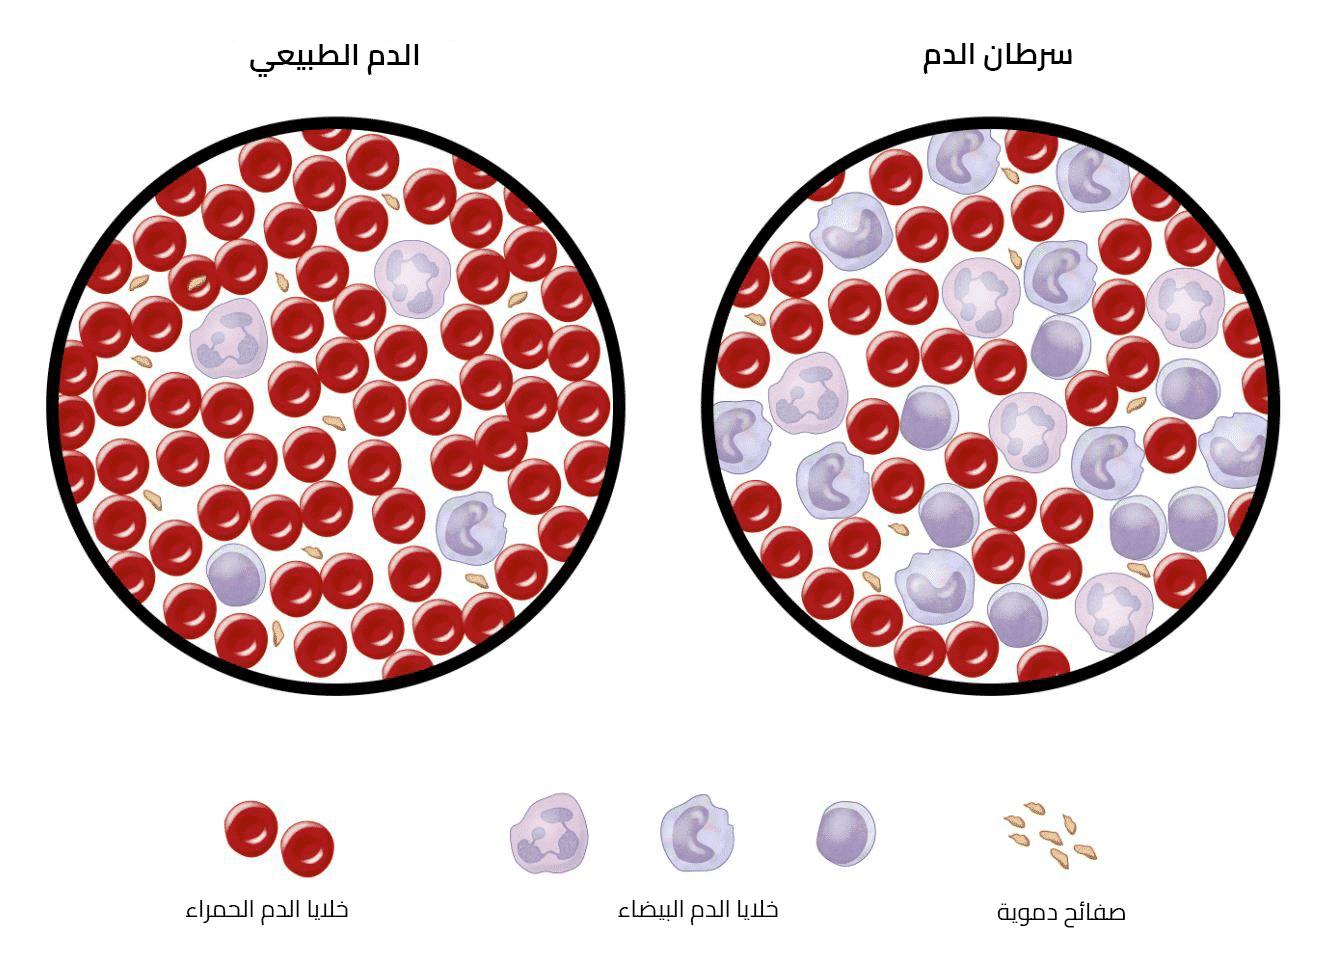 Photo of سرطان الدم كيف تحدث الاصابة وماهي أنواعه وطرق التشخيص والعلاج